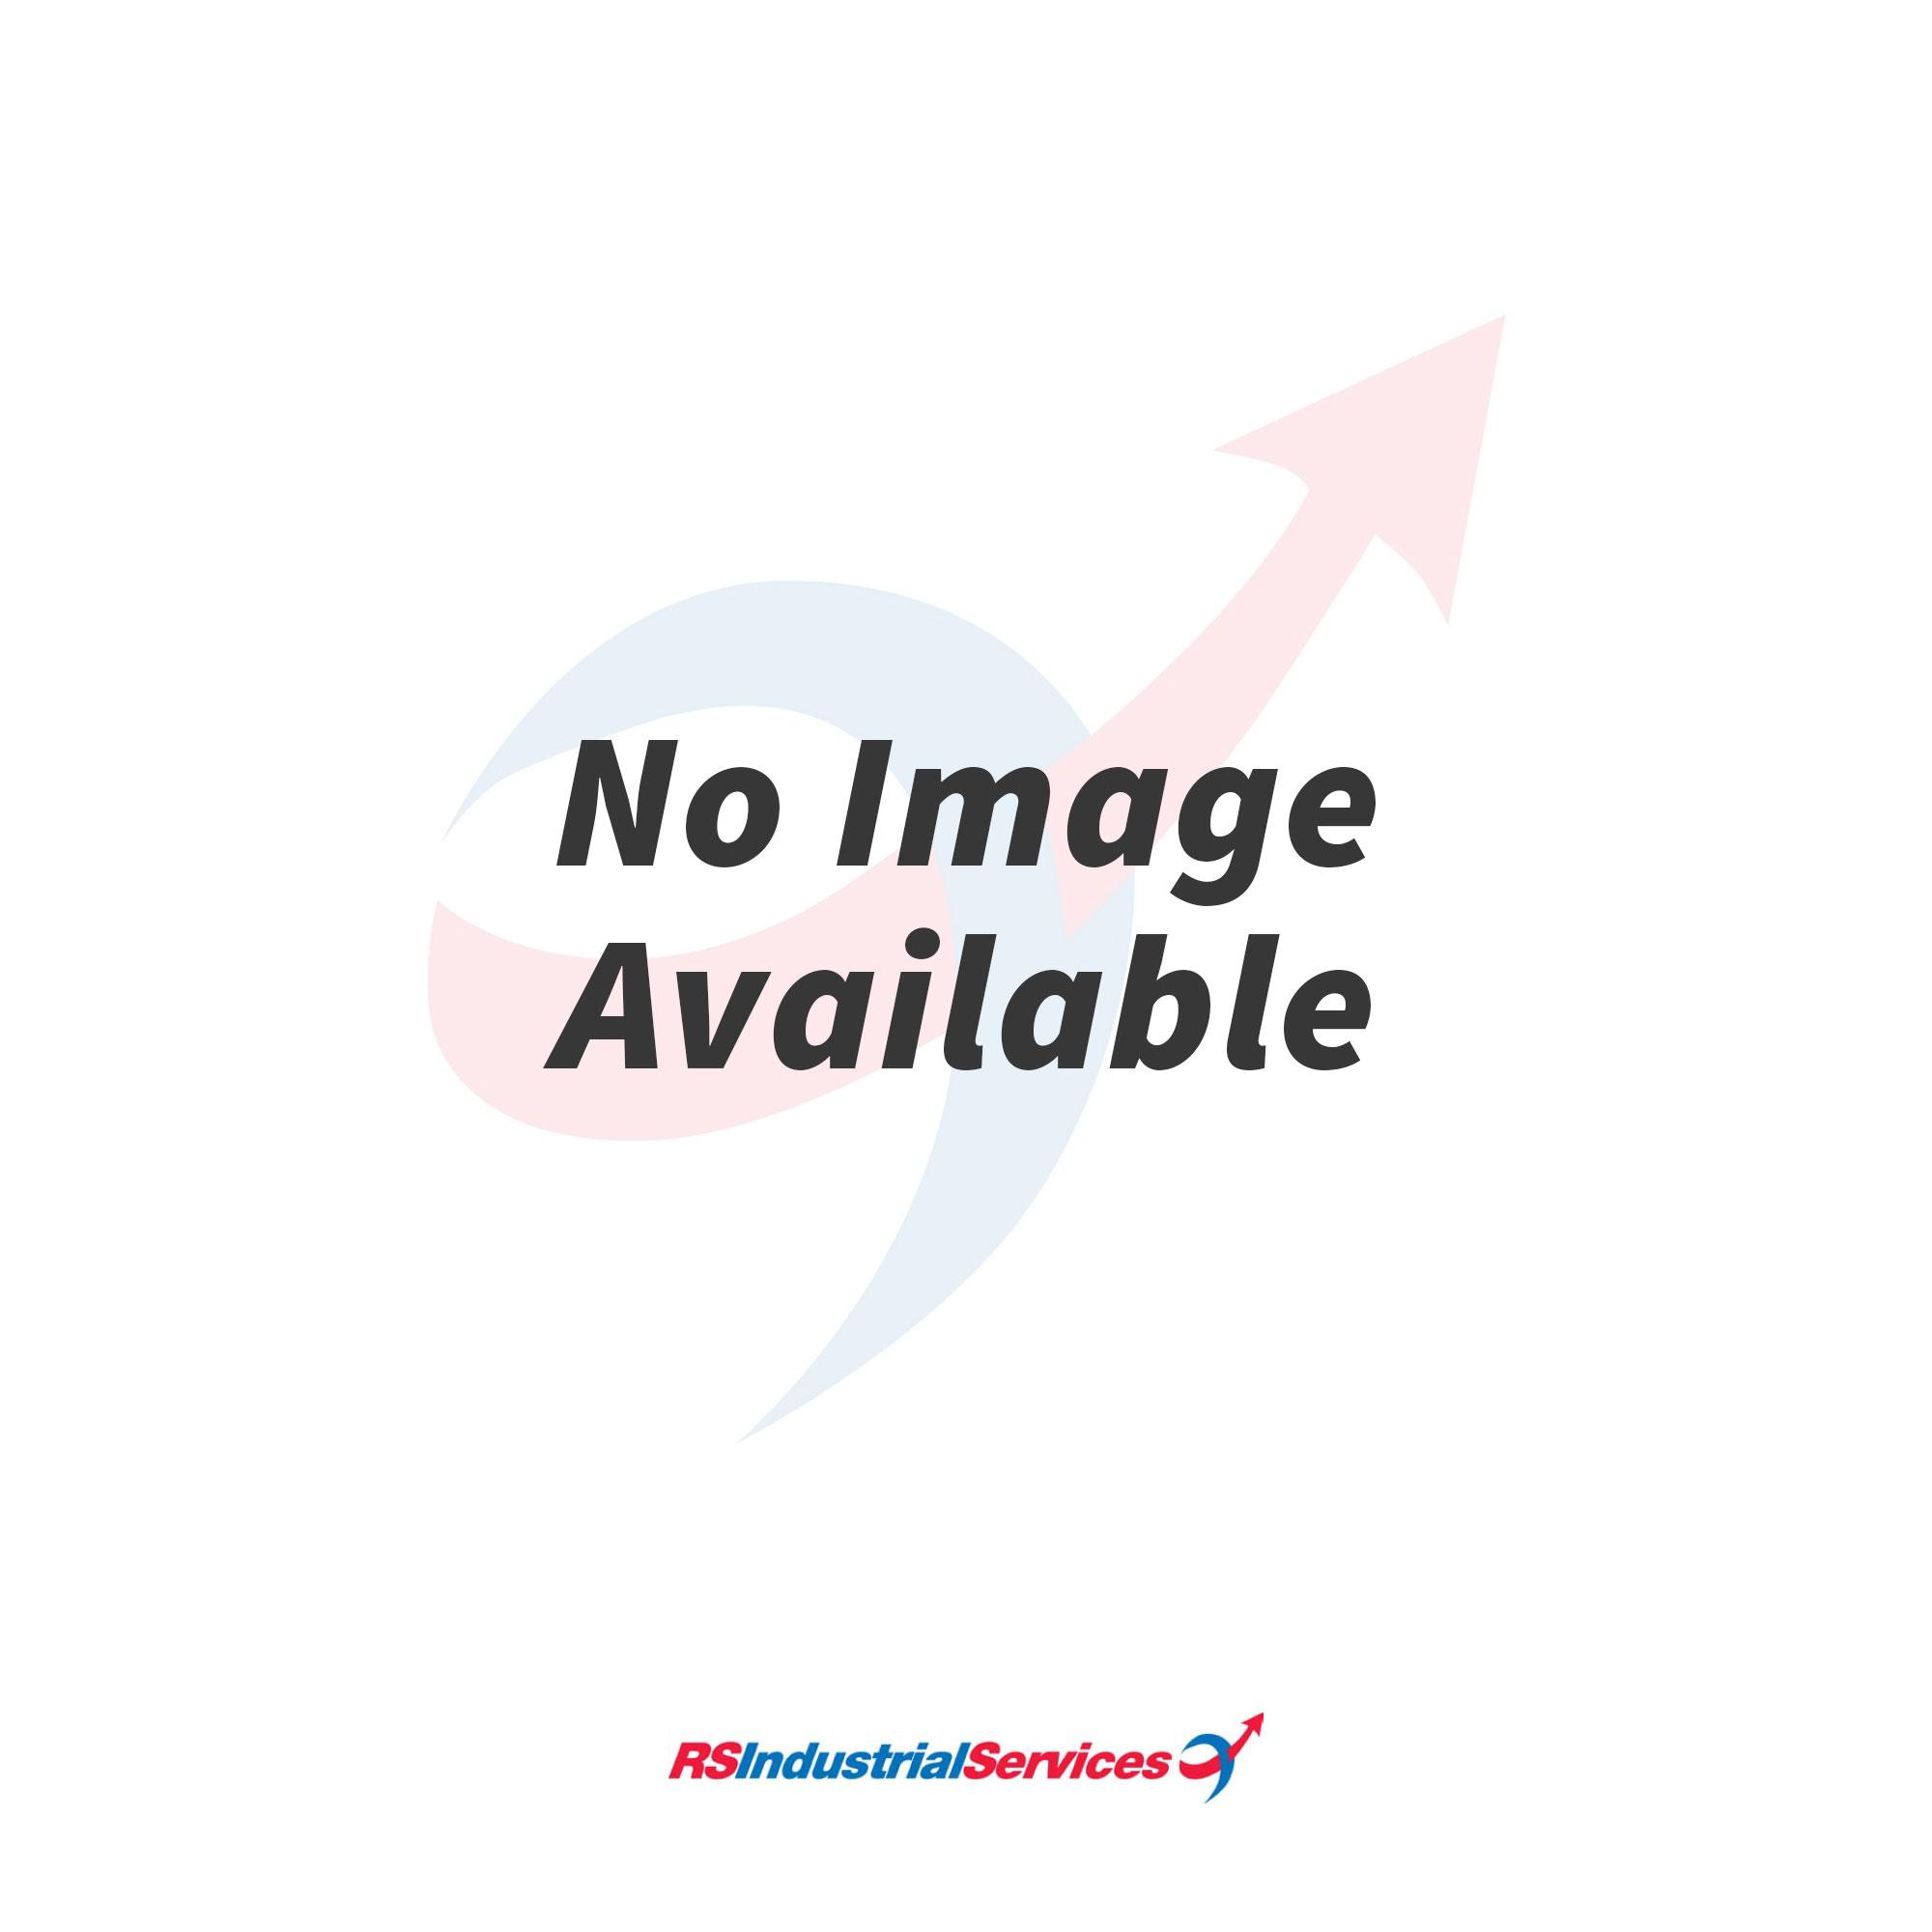 Codipro Mega DSS Gradup Male Double Swivel Shackle (EN1677)